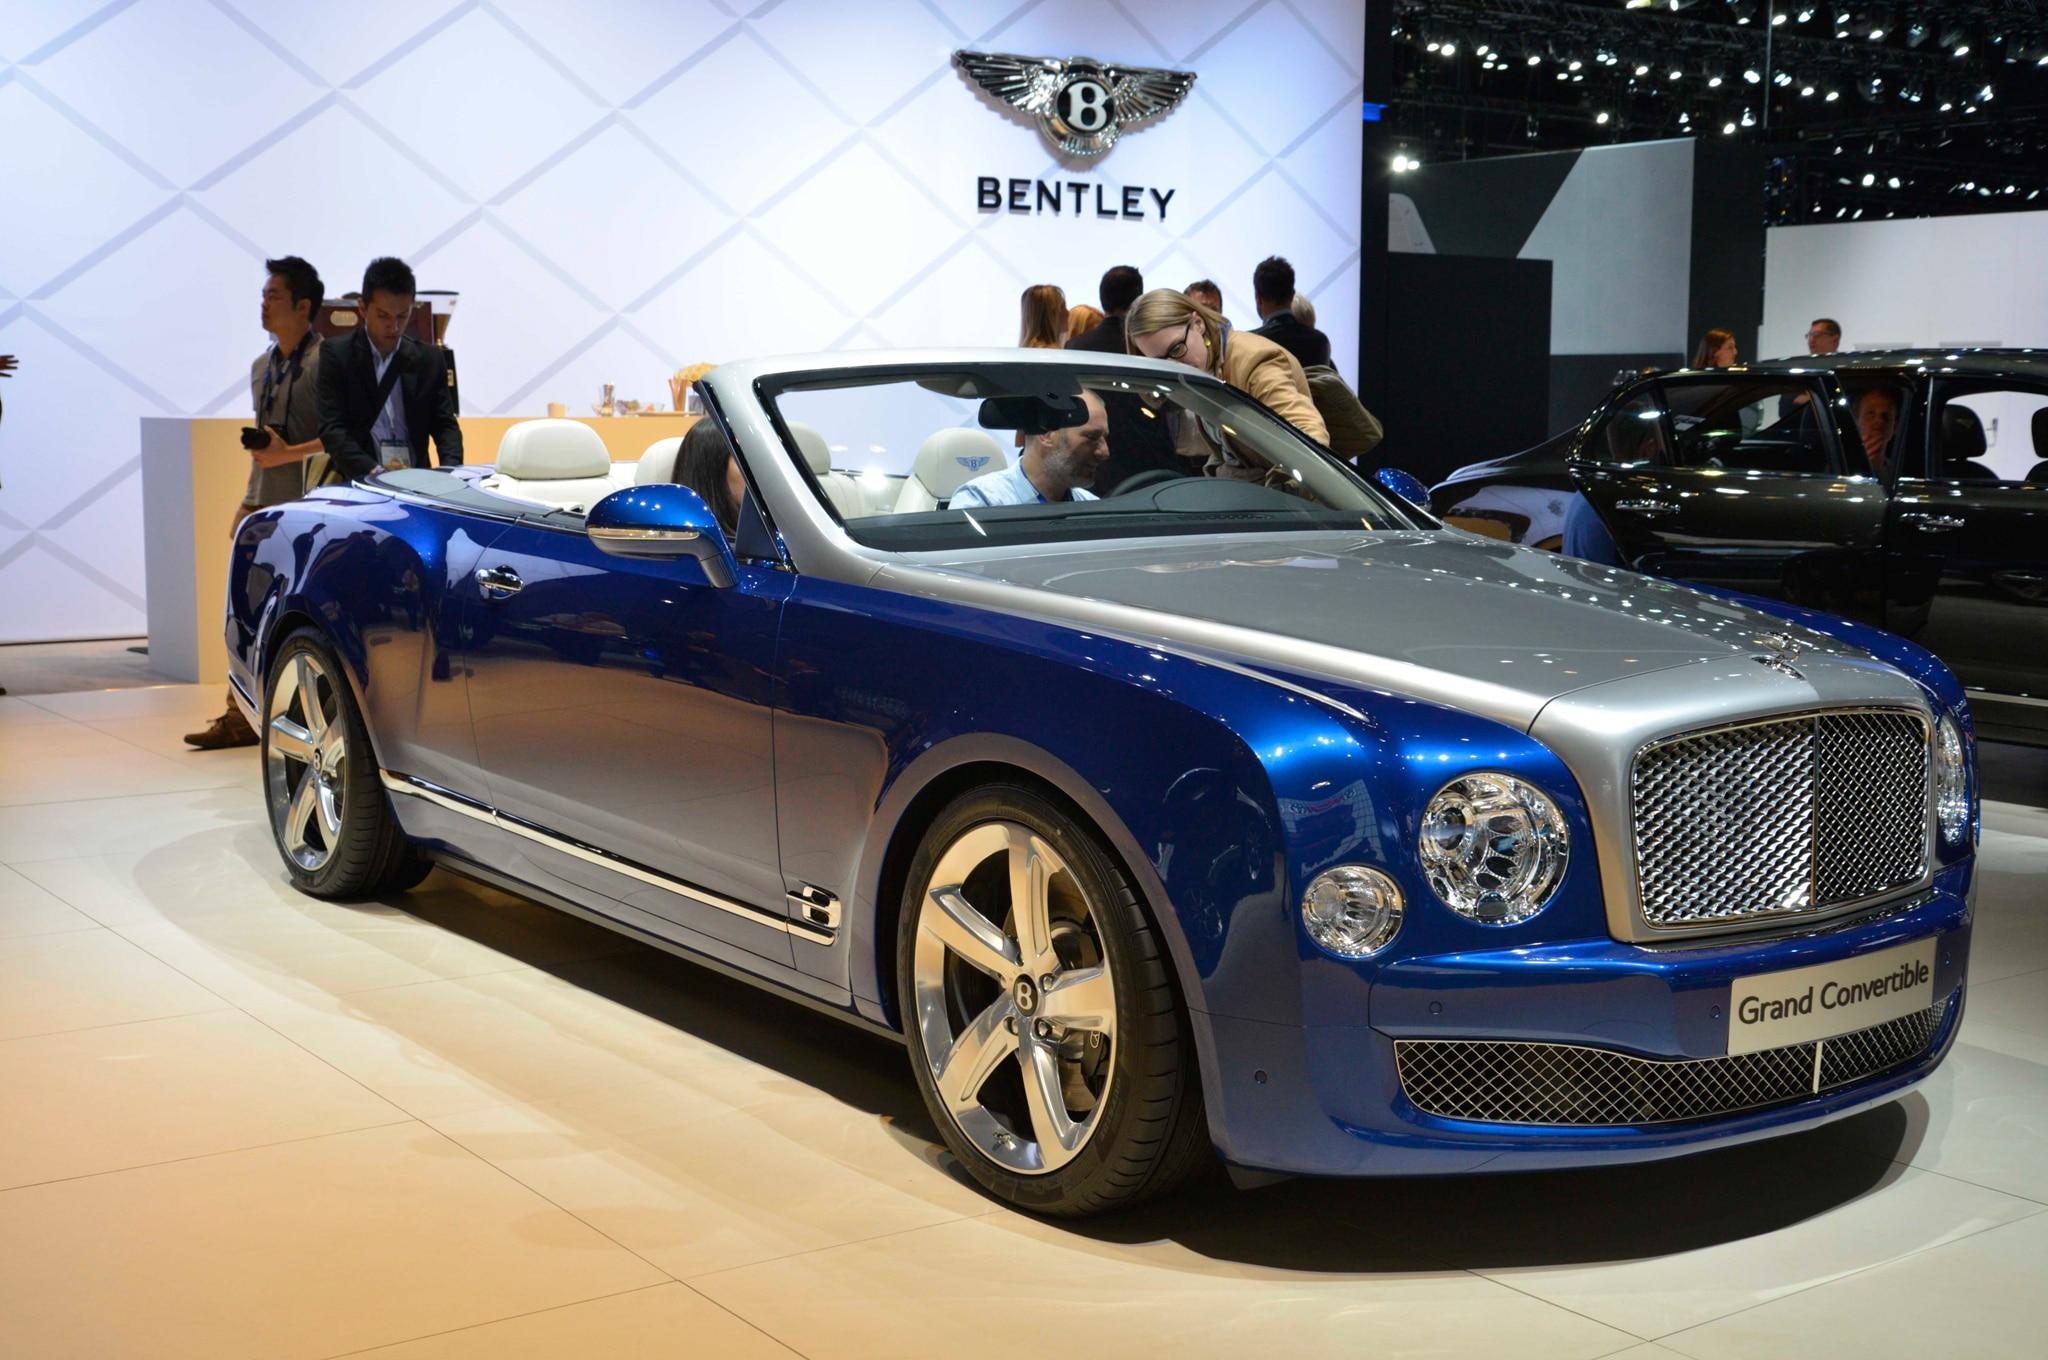 Bentley Mulsanne Grand Convertible Due Soon; New ...